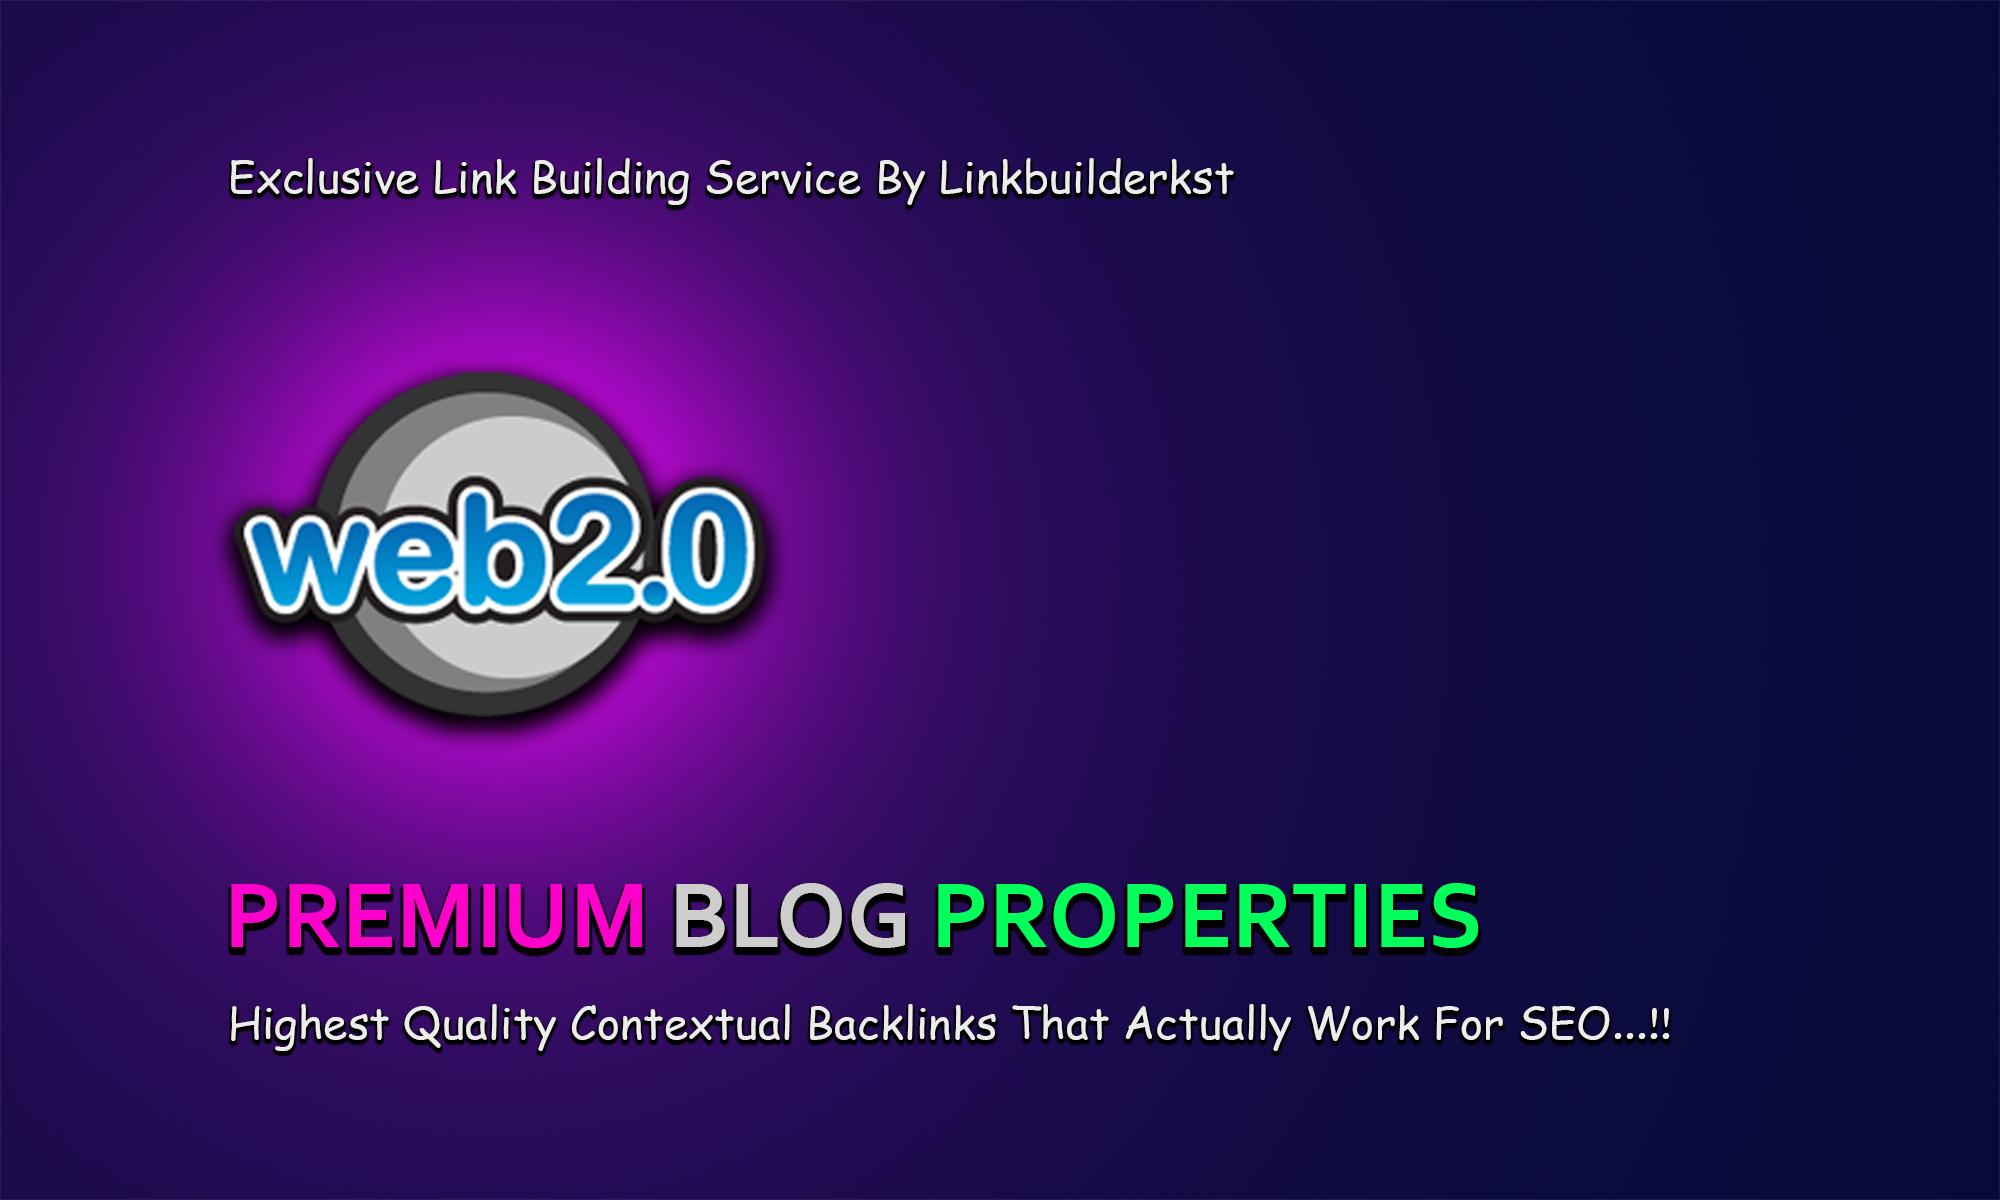 10 Premium Web 2.0 Buffer Blog Properties With Login & Unique Content